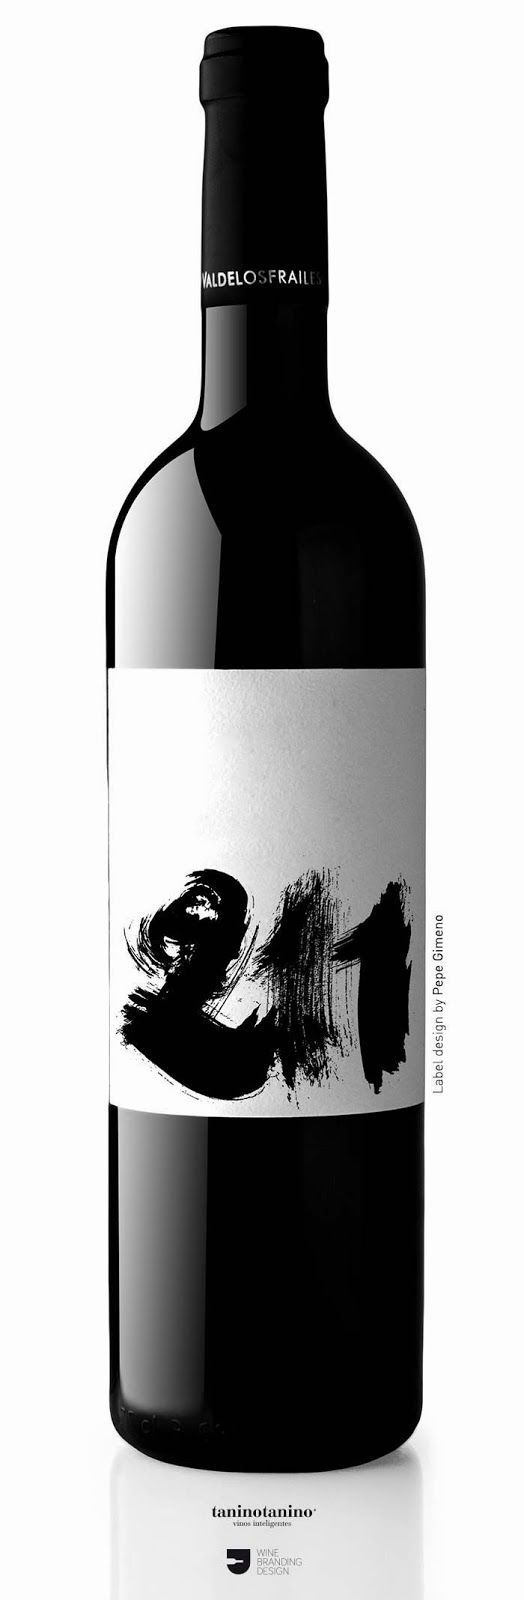 label / 211 - wine